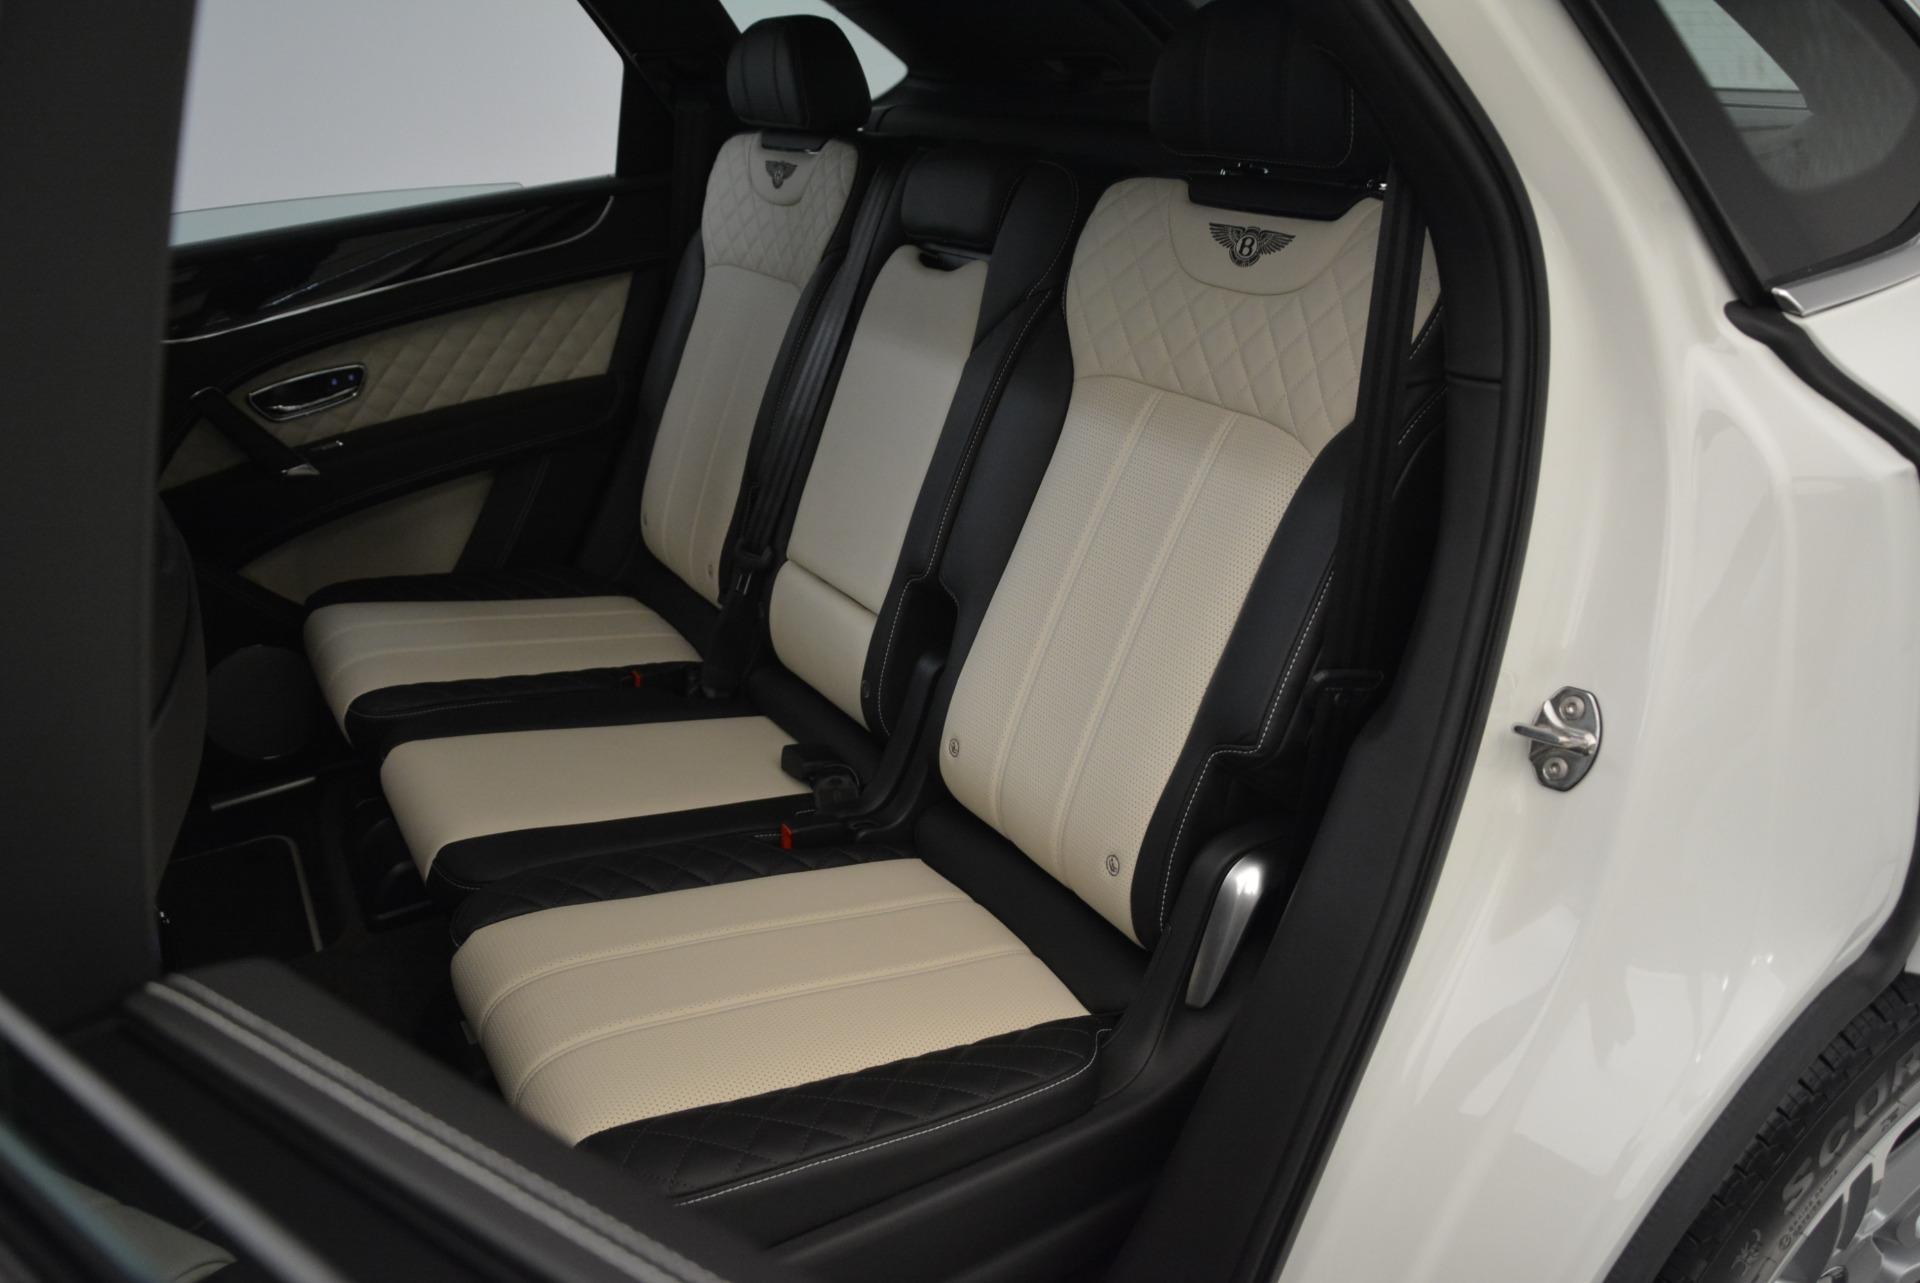 Used 2018 Bentley Bentayga Activity Edition For Sale In Westport, CT 1922_p22